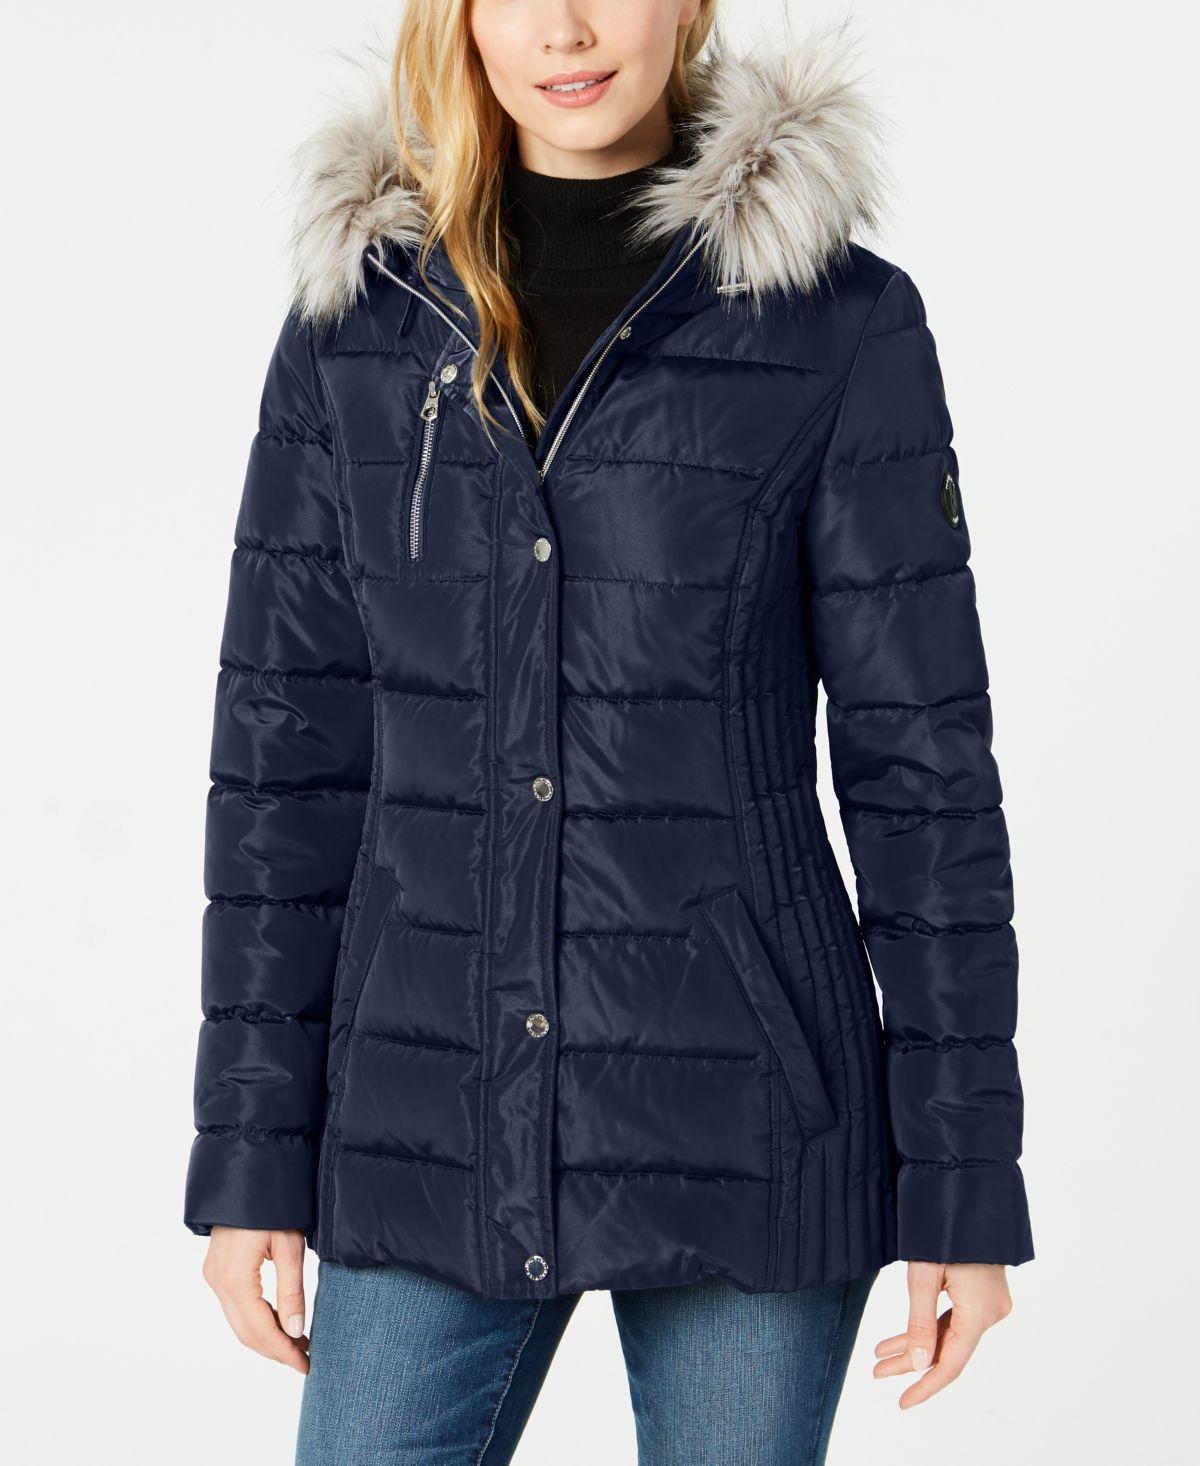 Nautica Hooded Faux Fur Trim Puffer Coat Navy Seas Coats For Women Zip Coat Hooded Faux [ 1466 x 1200 Pixel ]